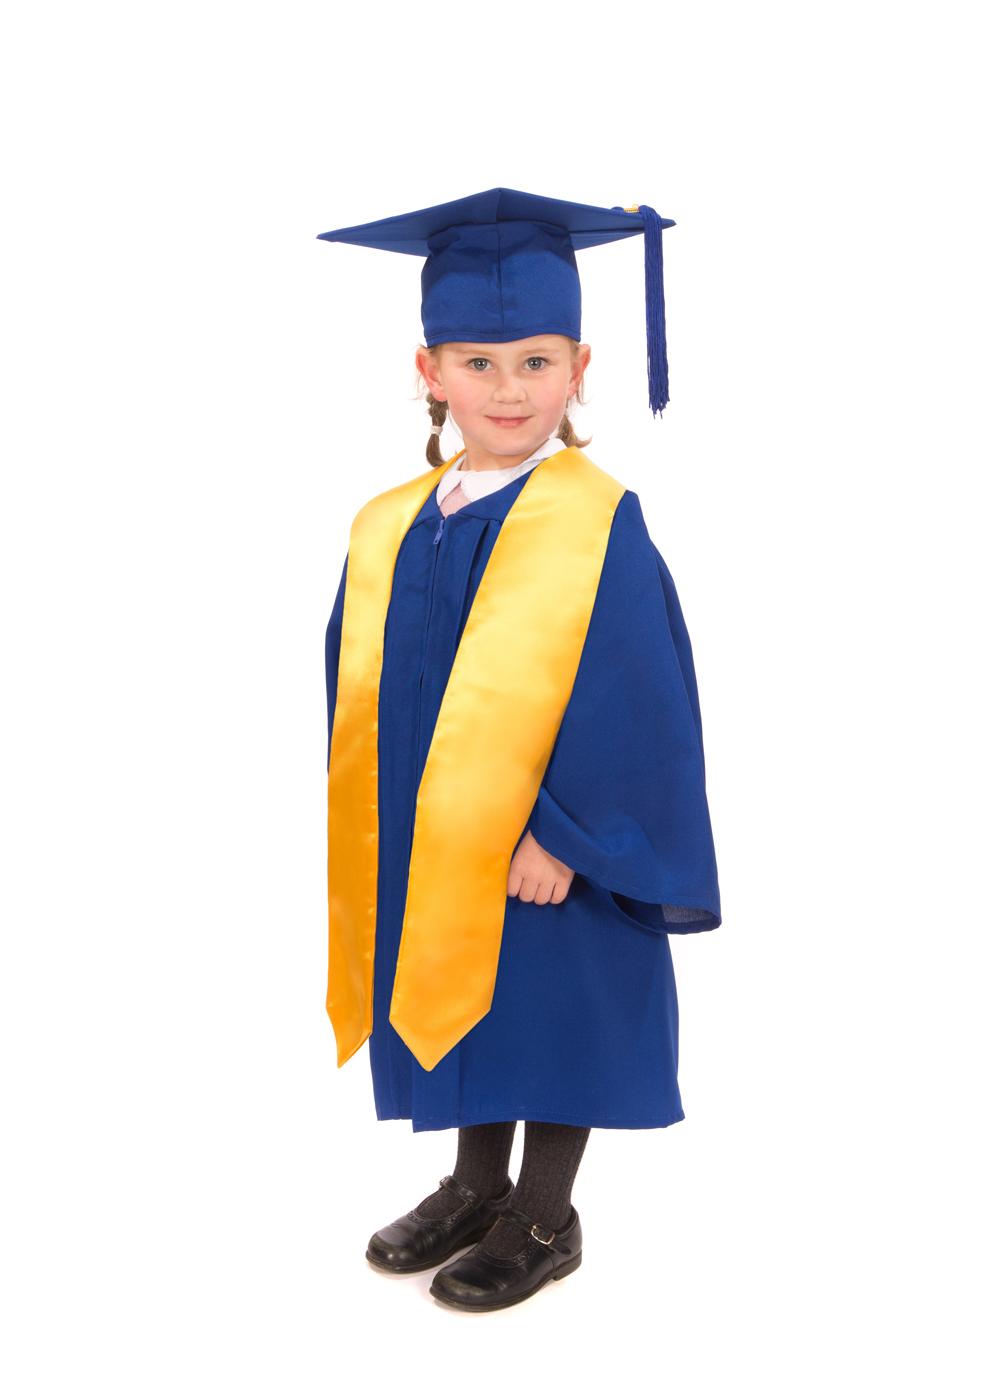 Nursery Graduation Gown Matte Available From Graduation Attire